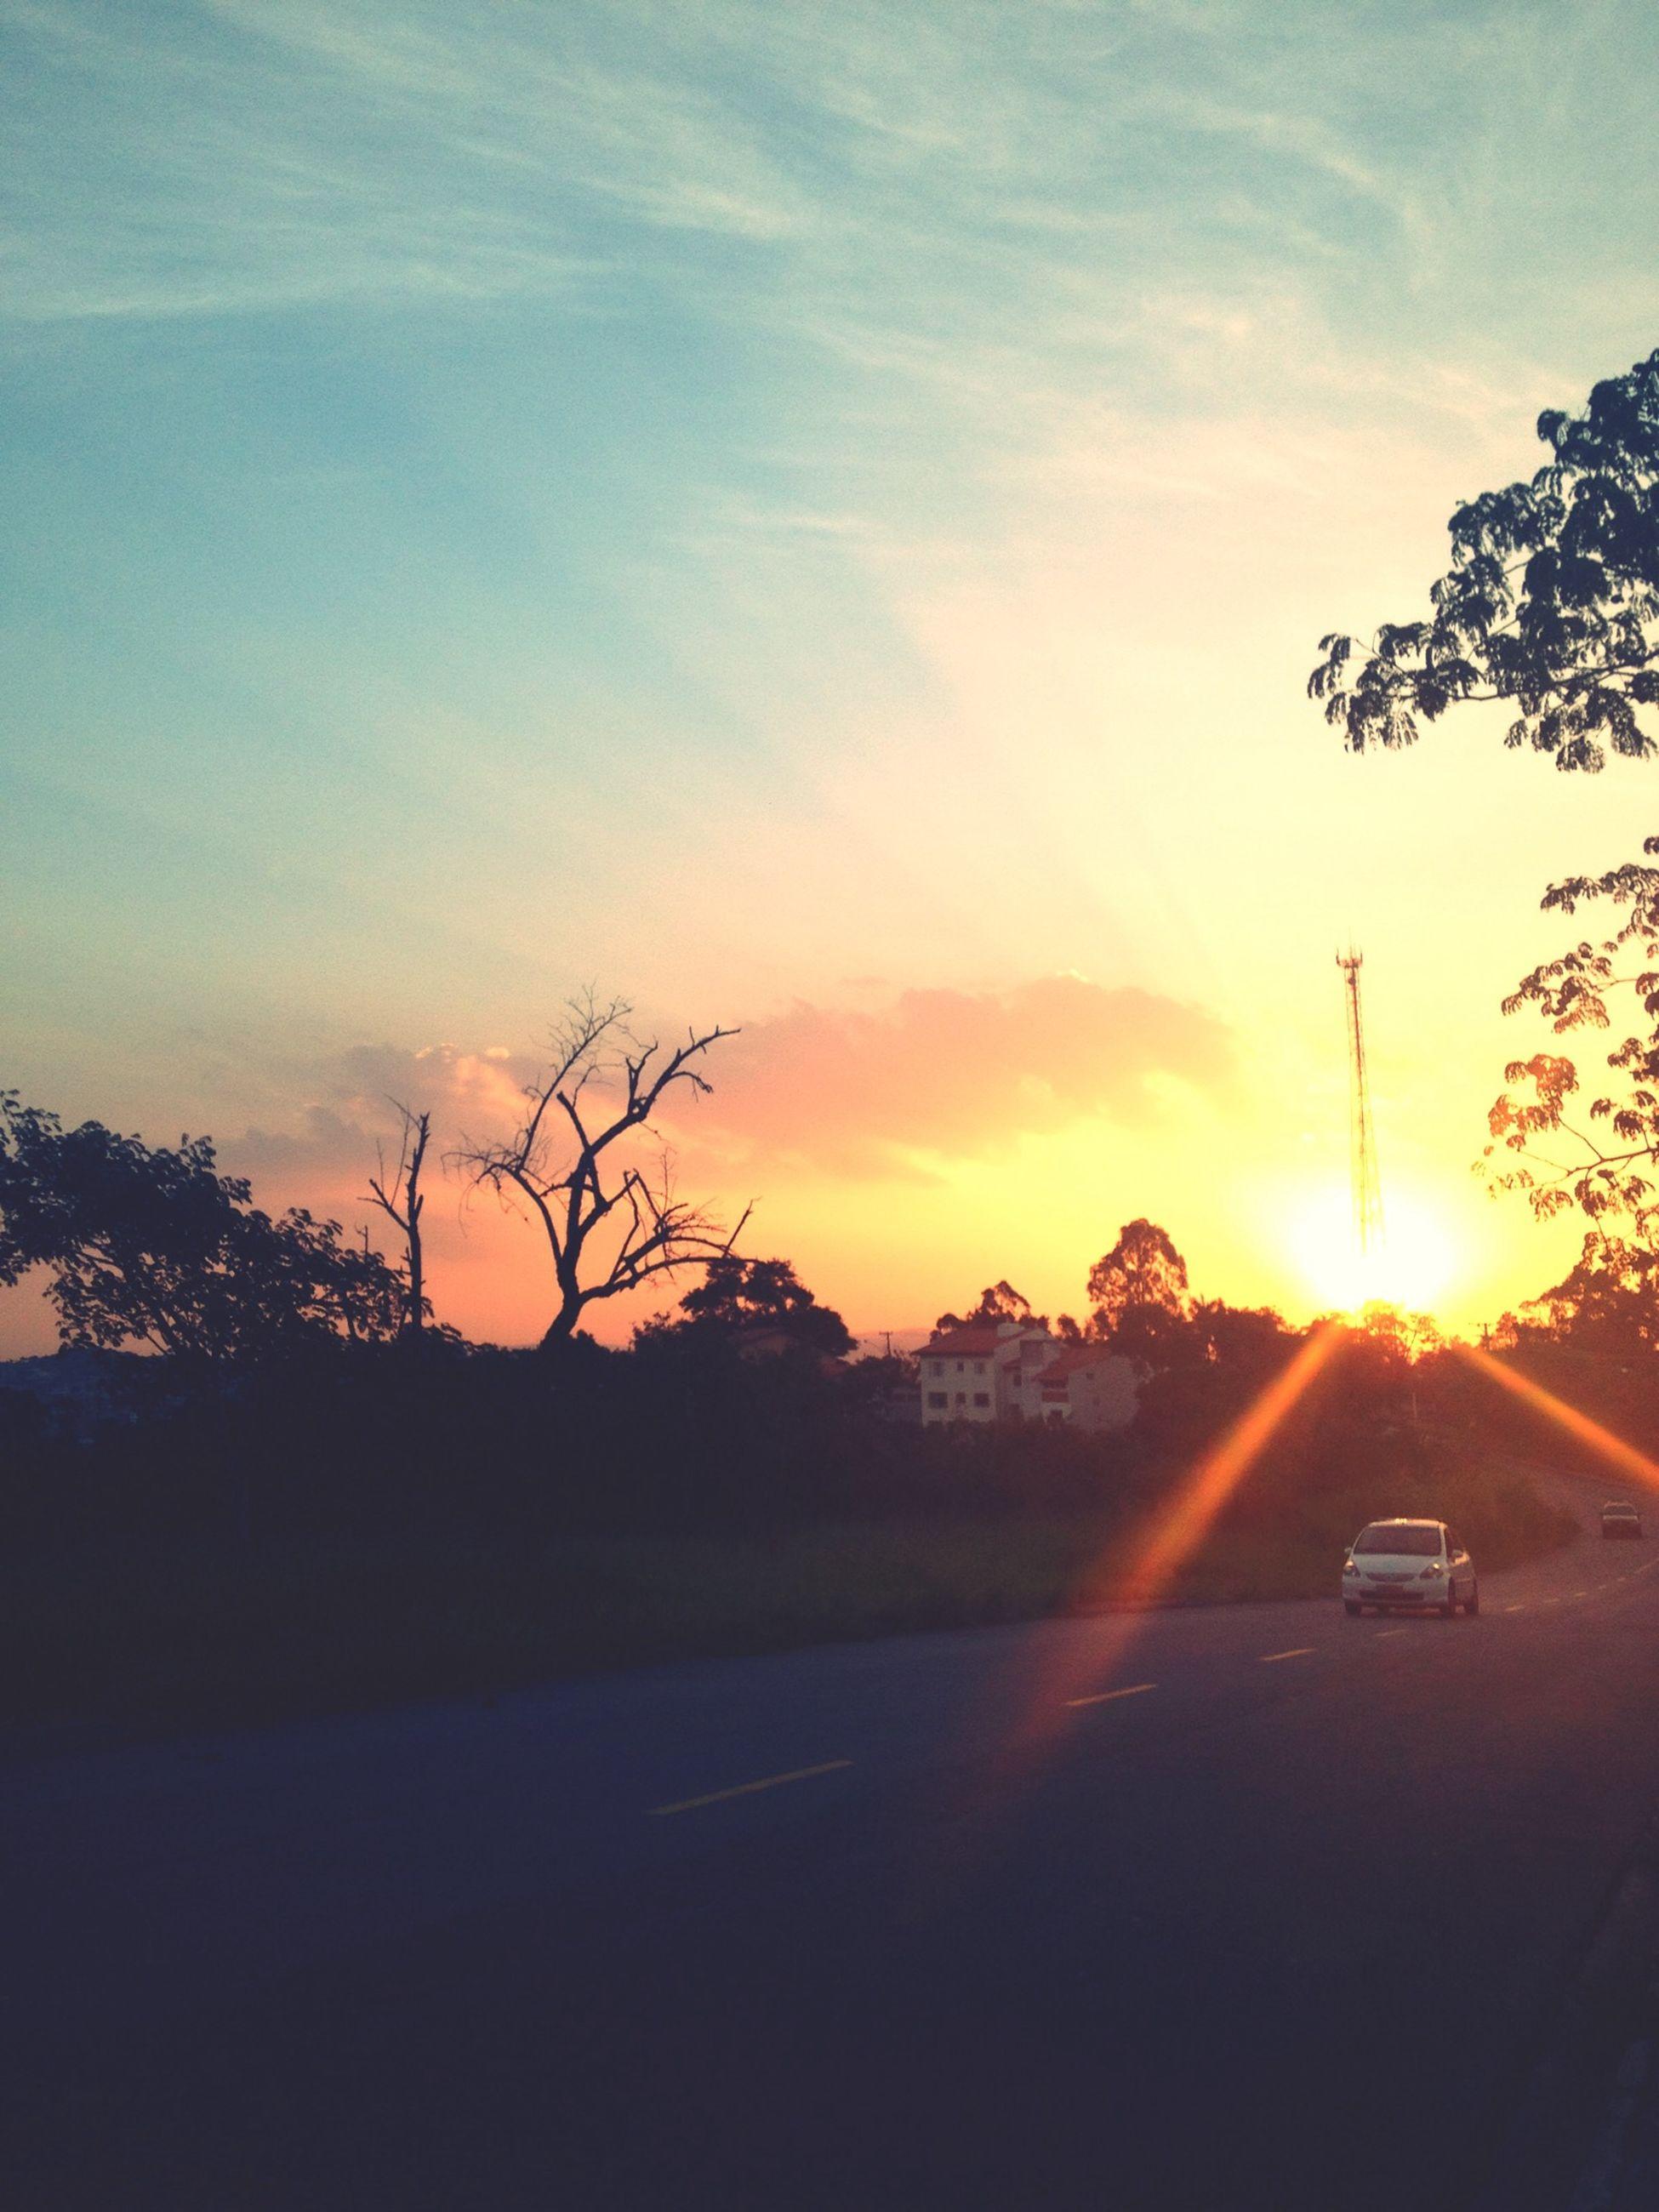 sunset, transportation, car, sun, land vehicle, road, tree, mode of transport, sky, sunlight, silhouette, sunbeam, street, cloud - sky, orange color, the way forward, lens flare, nature, scenics, beauty in nature